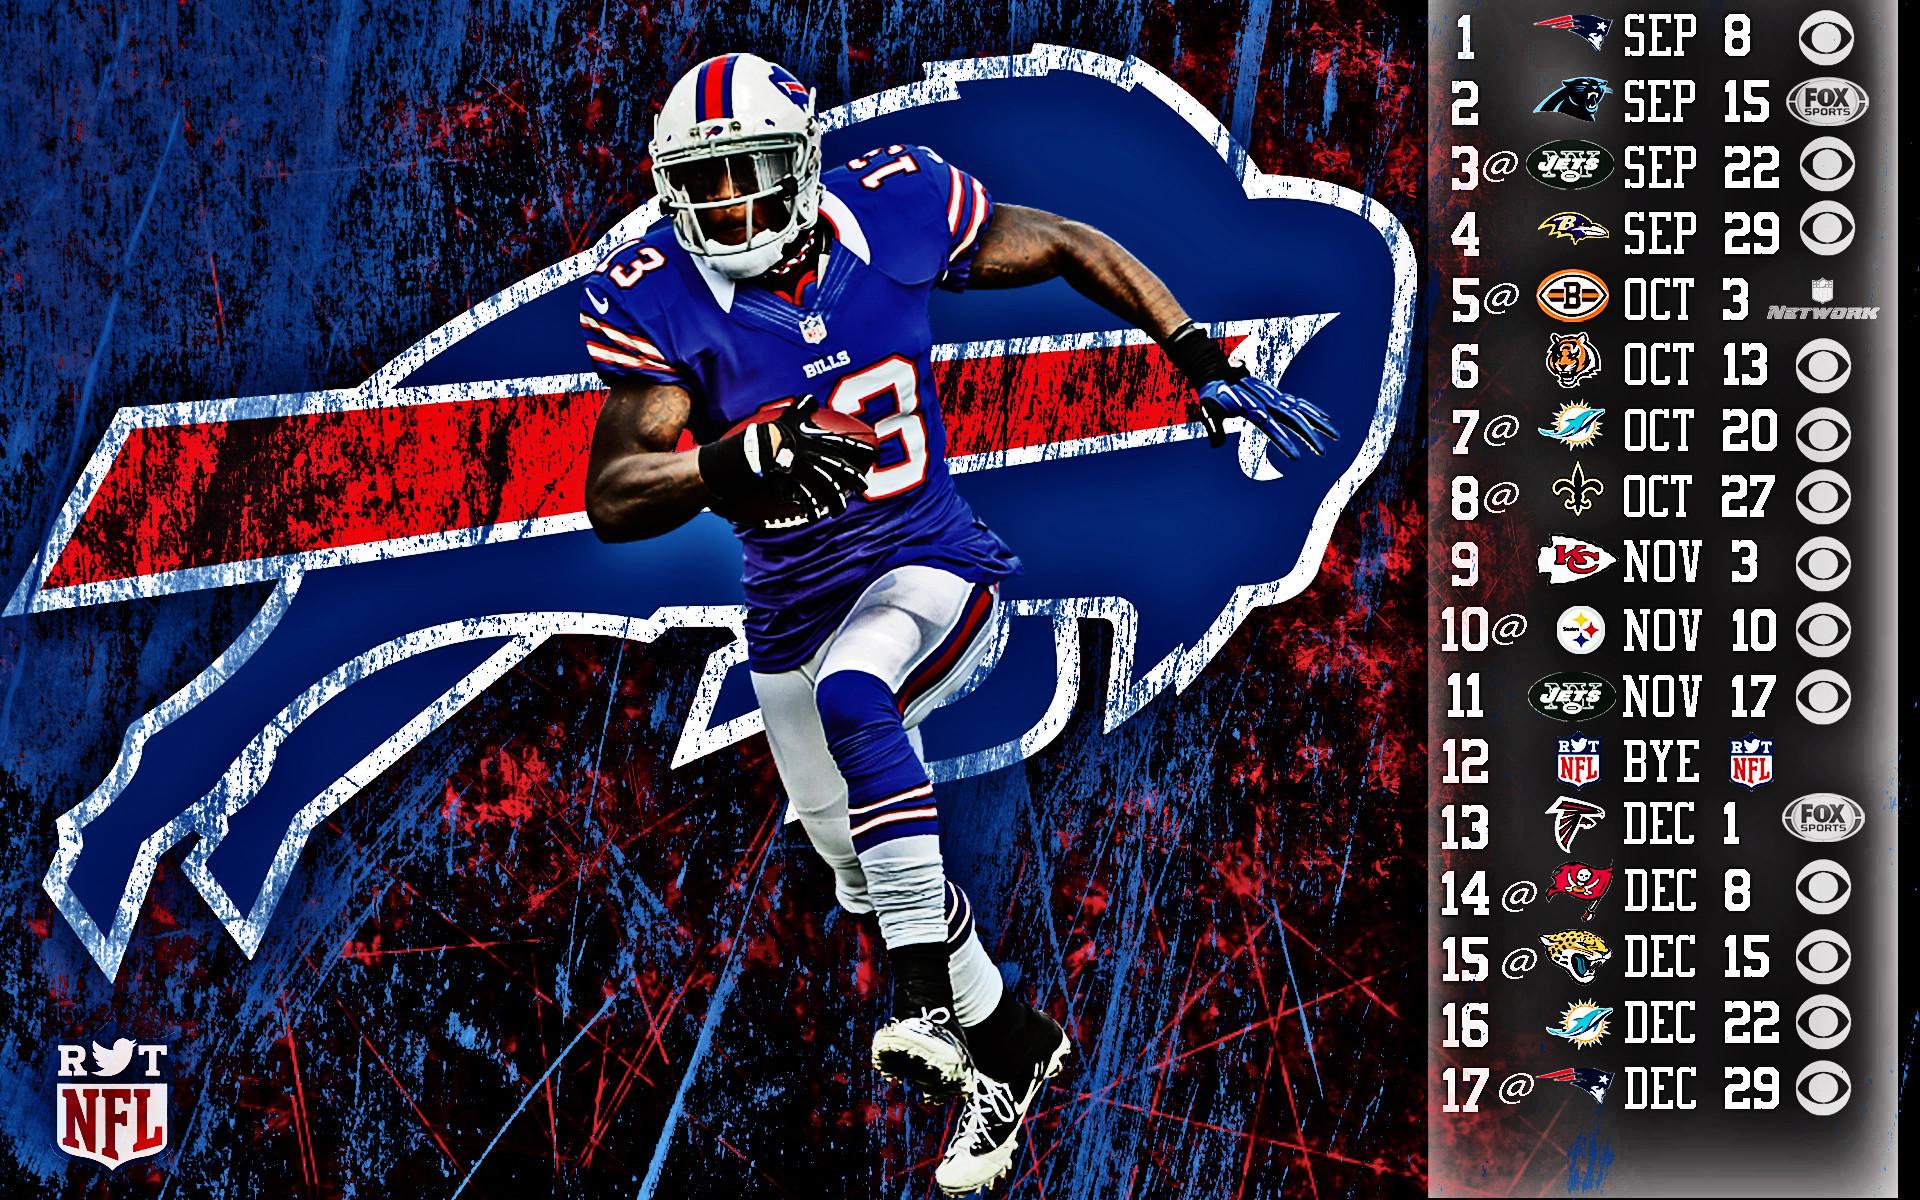 … Stevie Johnson 2013 Schedule HDR …